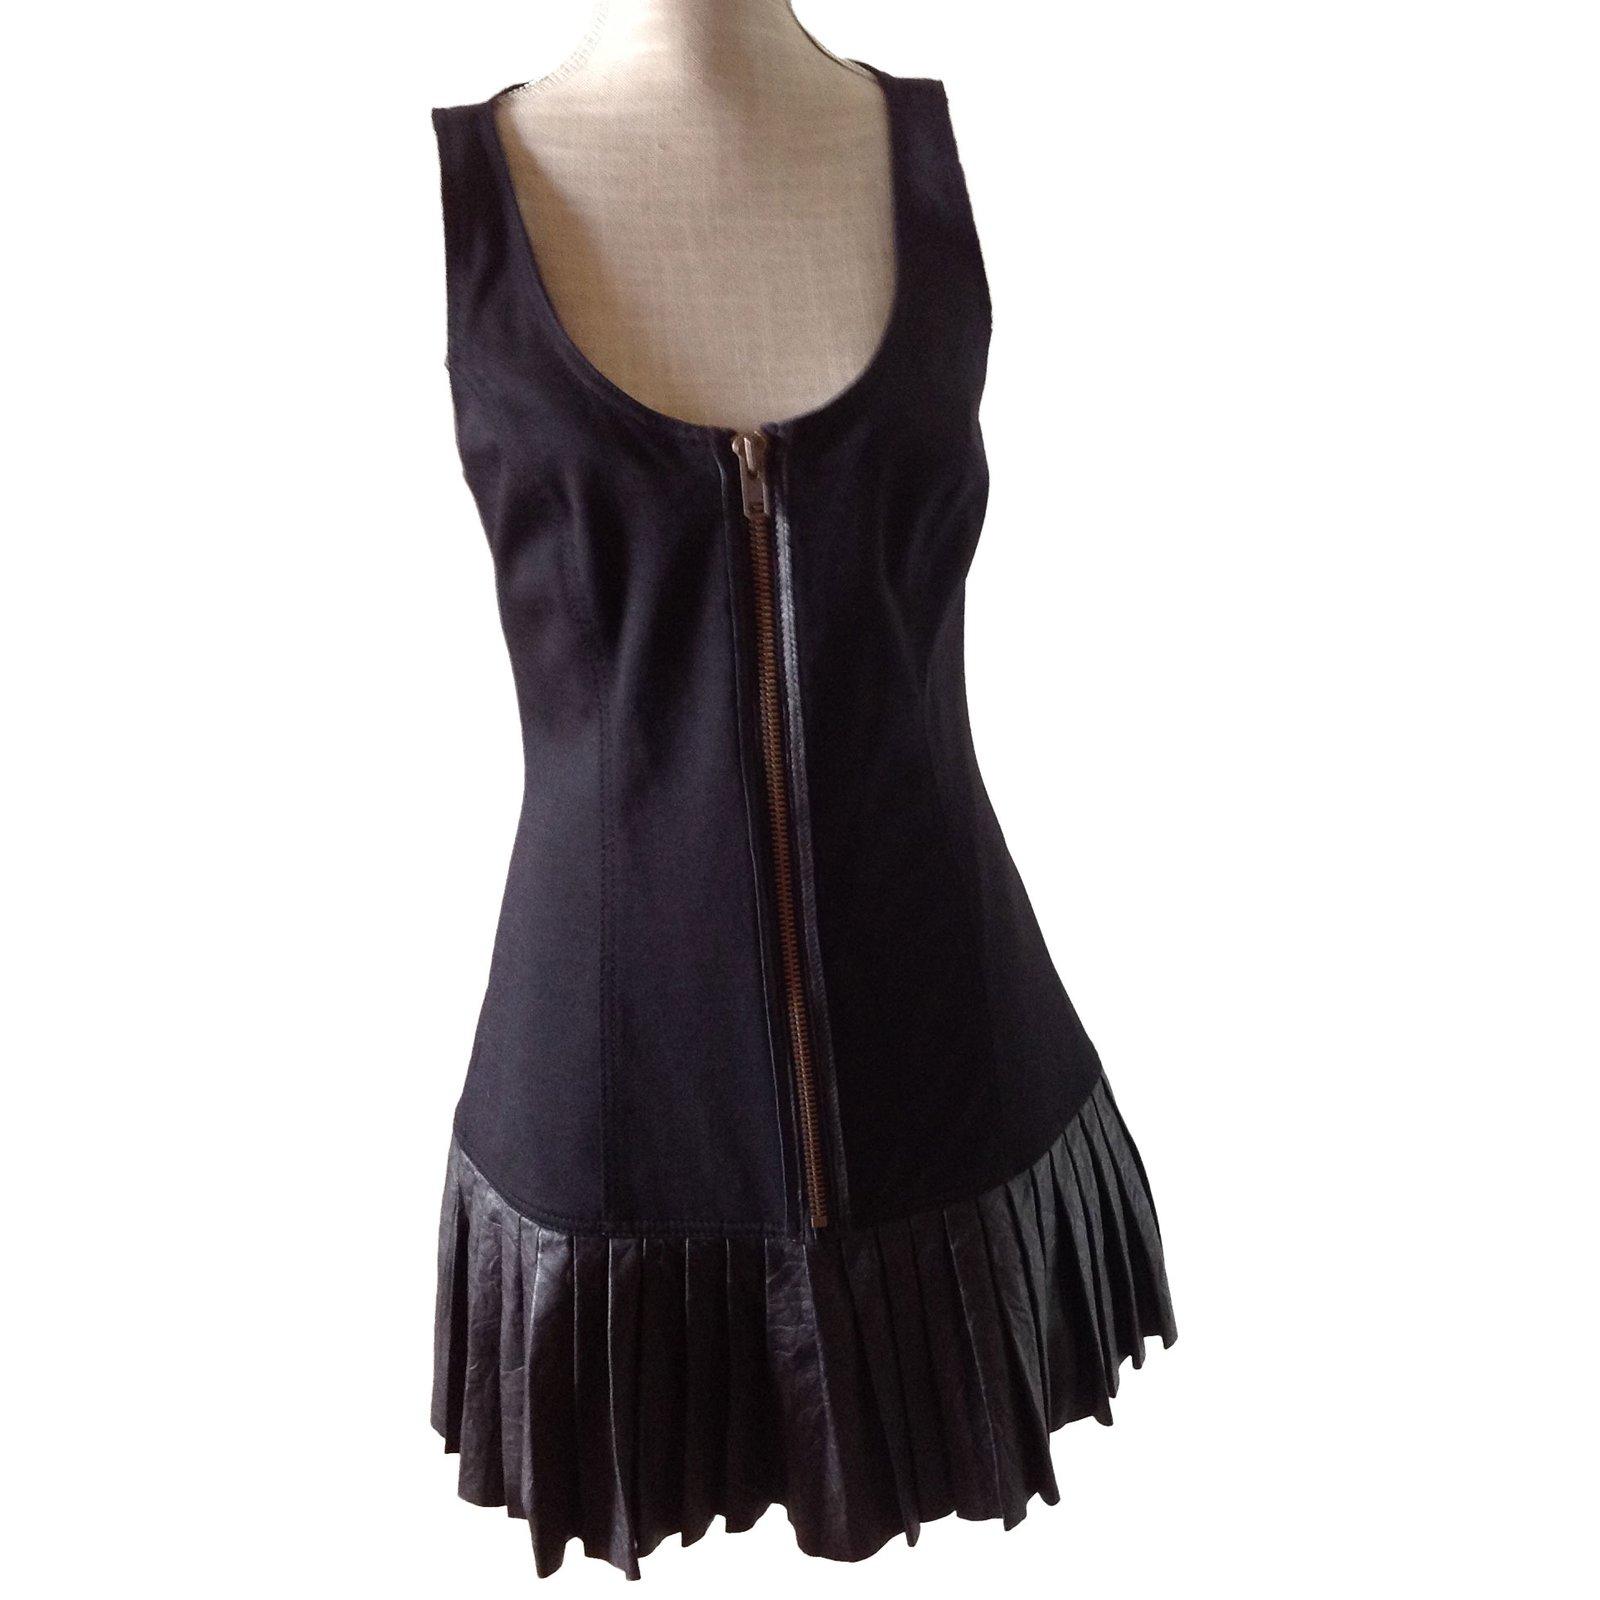 e56a6e091c2 Catherine Malandrino Dresses Dresses Cotton Black ref.46460 - Joli ...